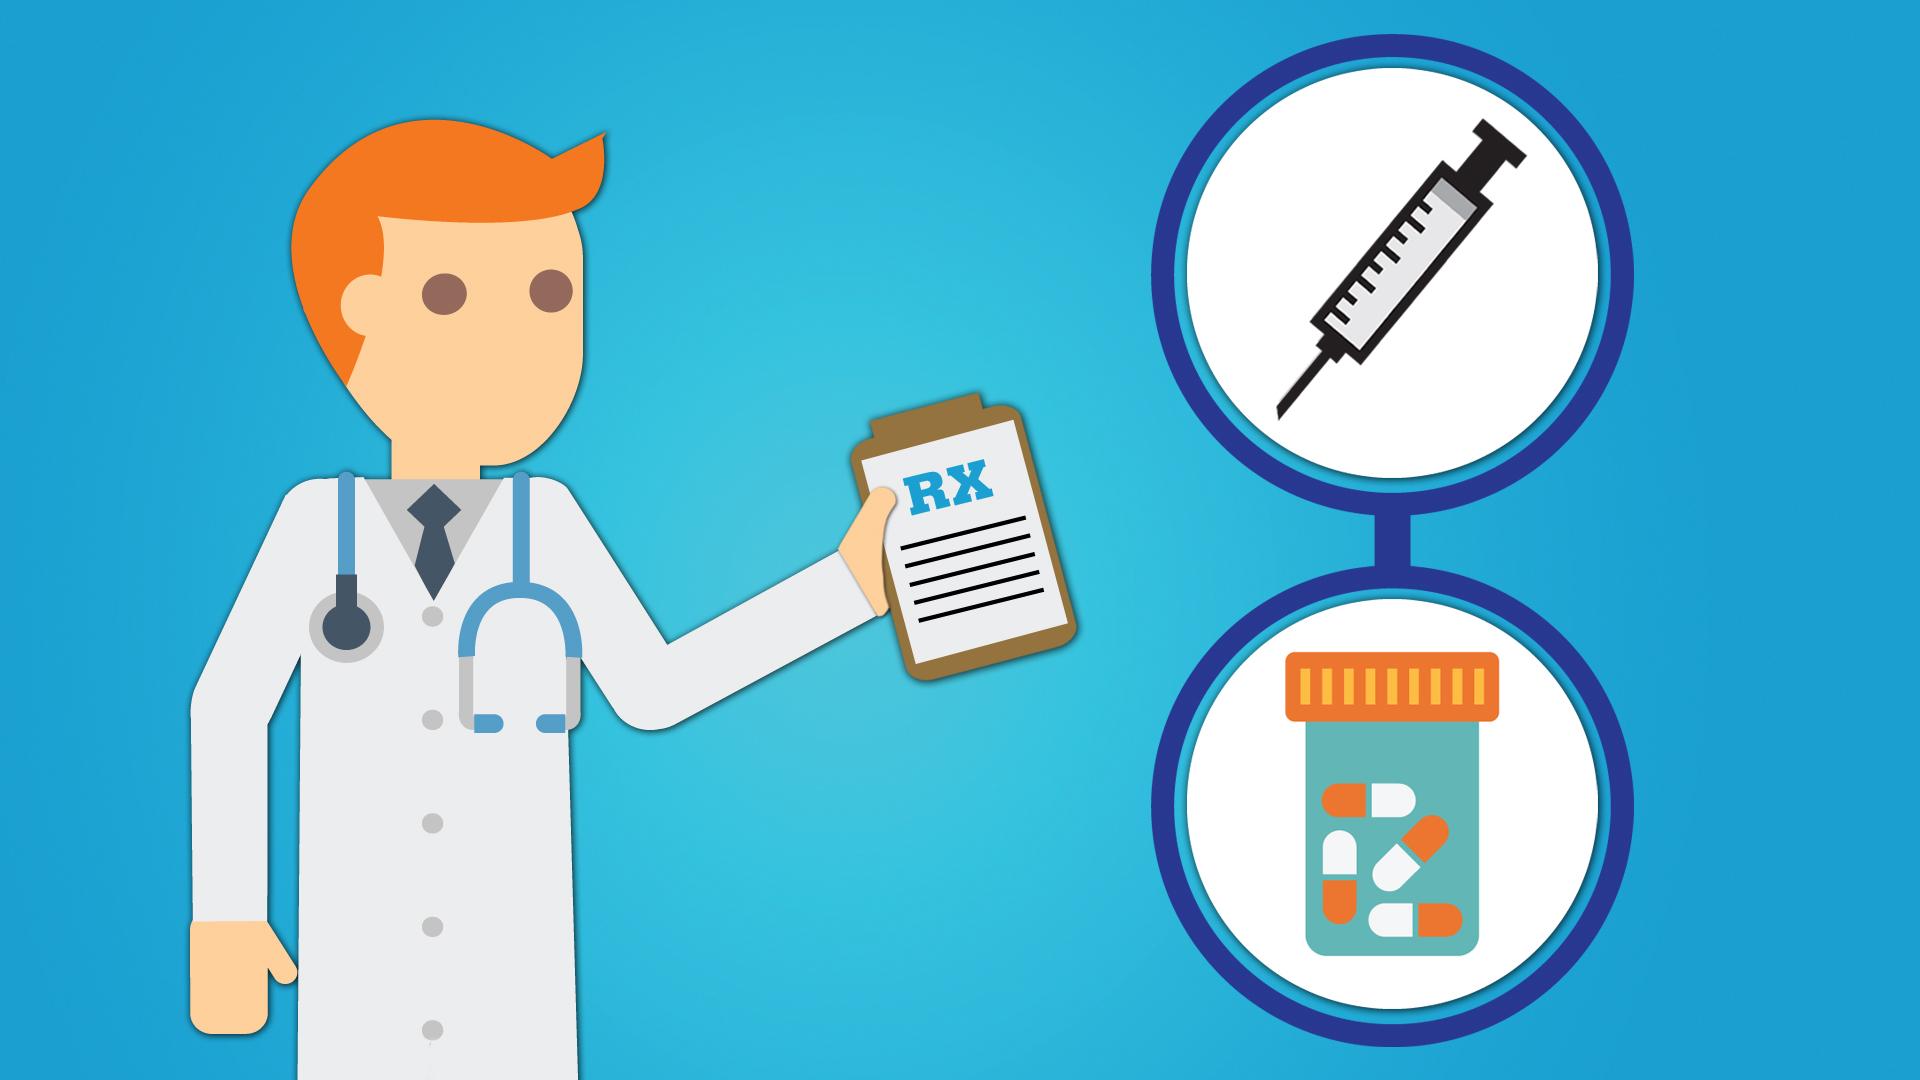 04.Treatment-Options-for-Type-2-Diabetes